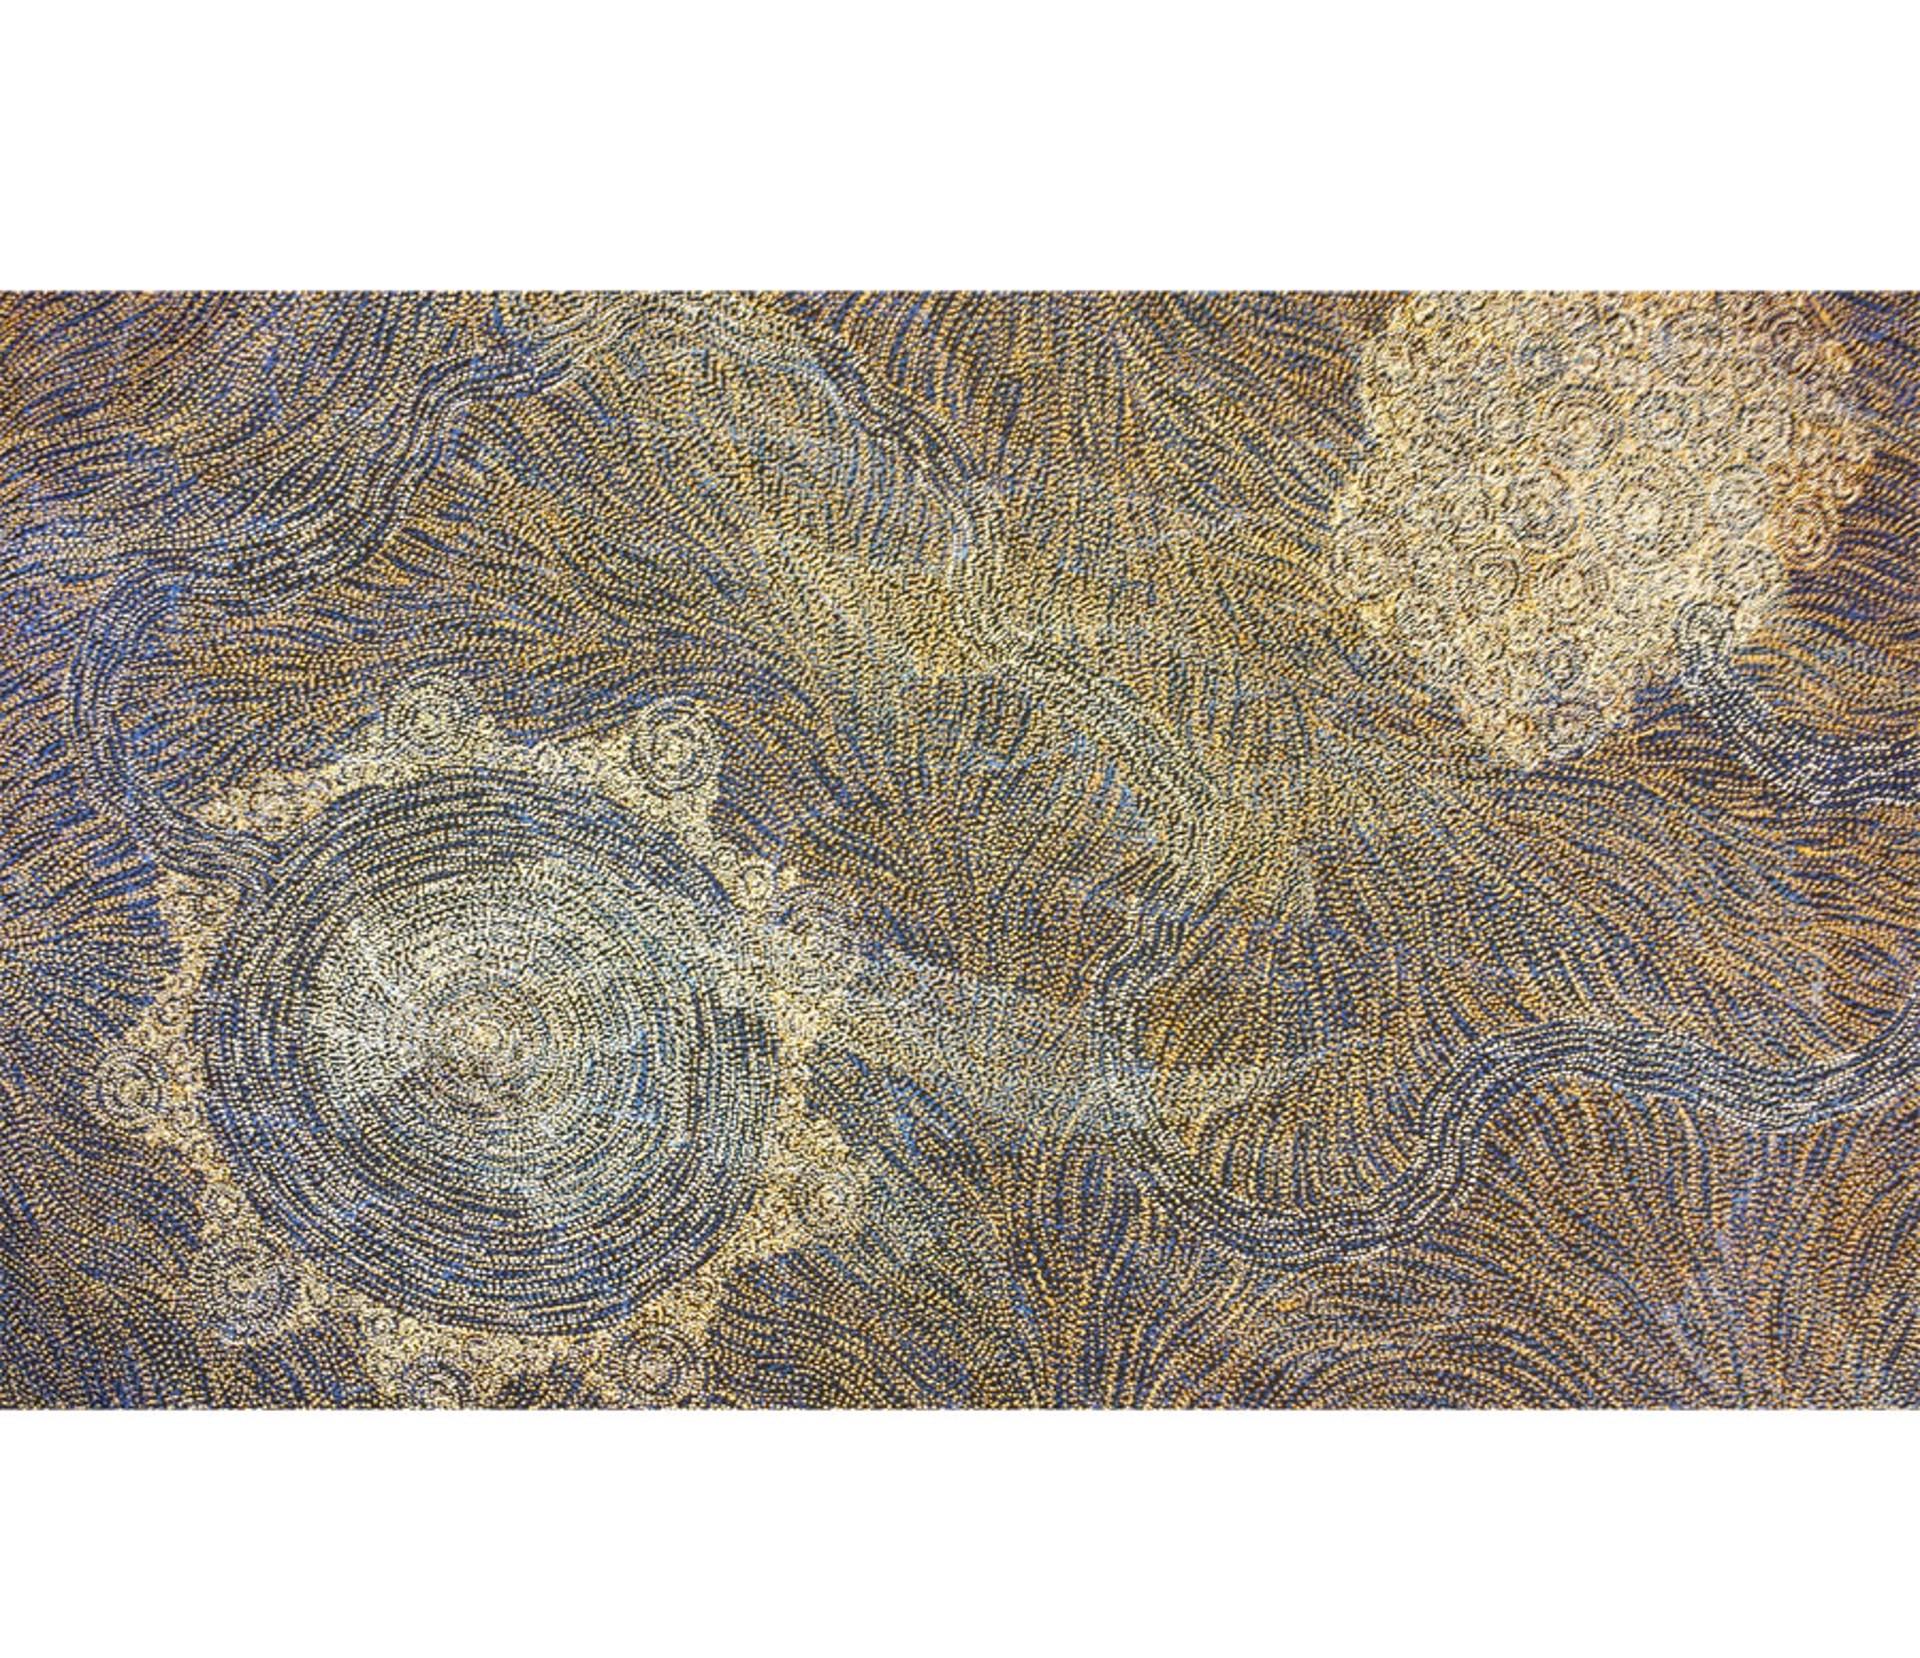 Ancestors by Australian Aboriginal Artists